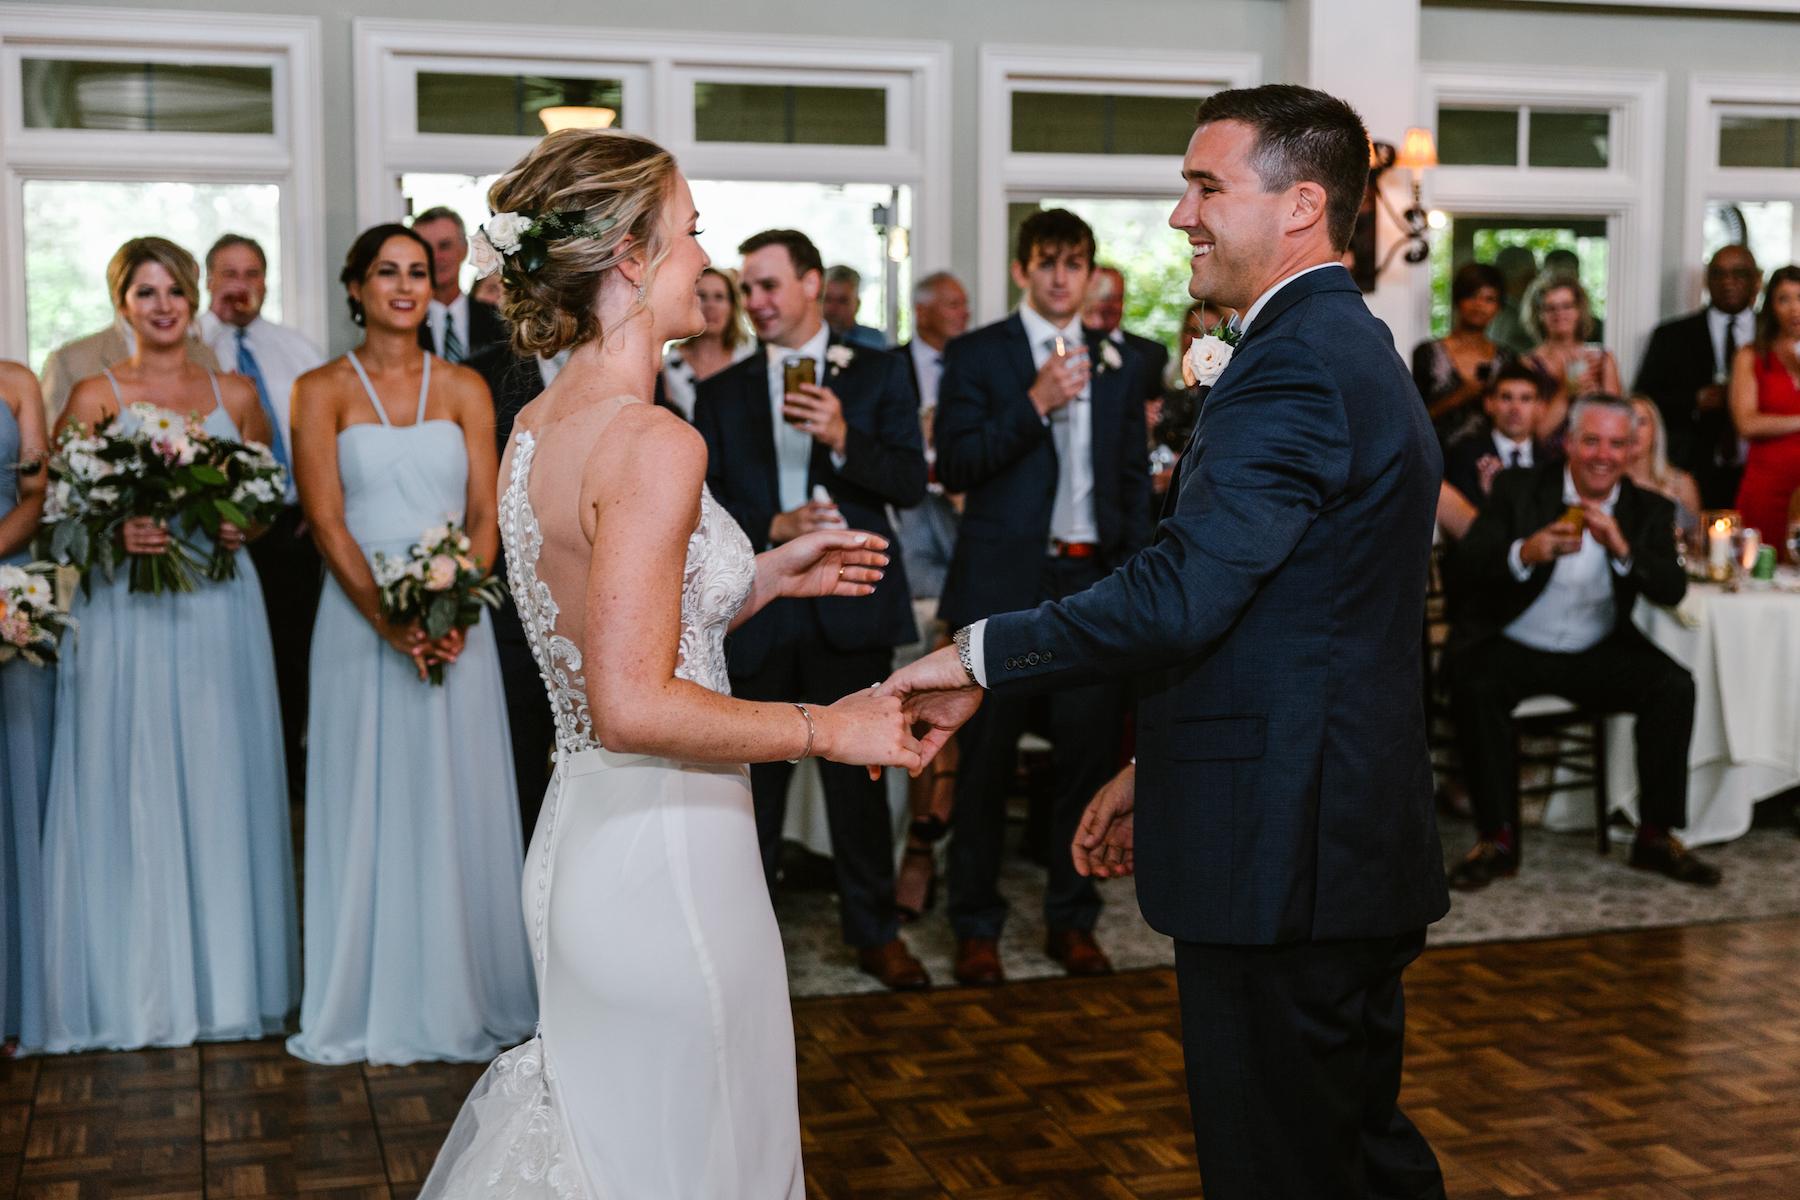 wedding-engagement-photographer-spartanburg-greenville-columbia-carolina-south-north-512.JPG